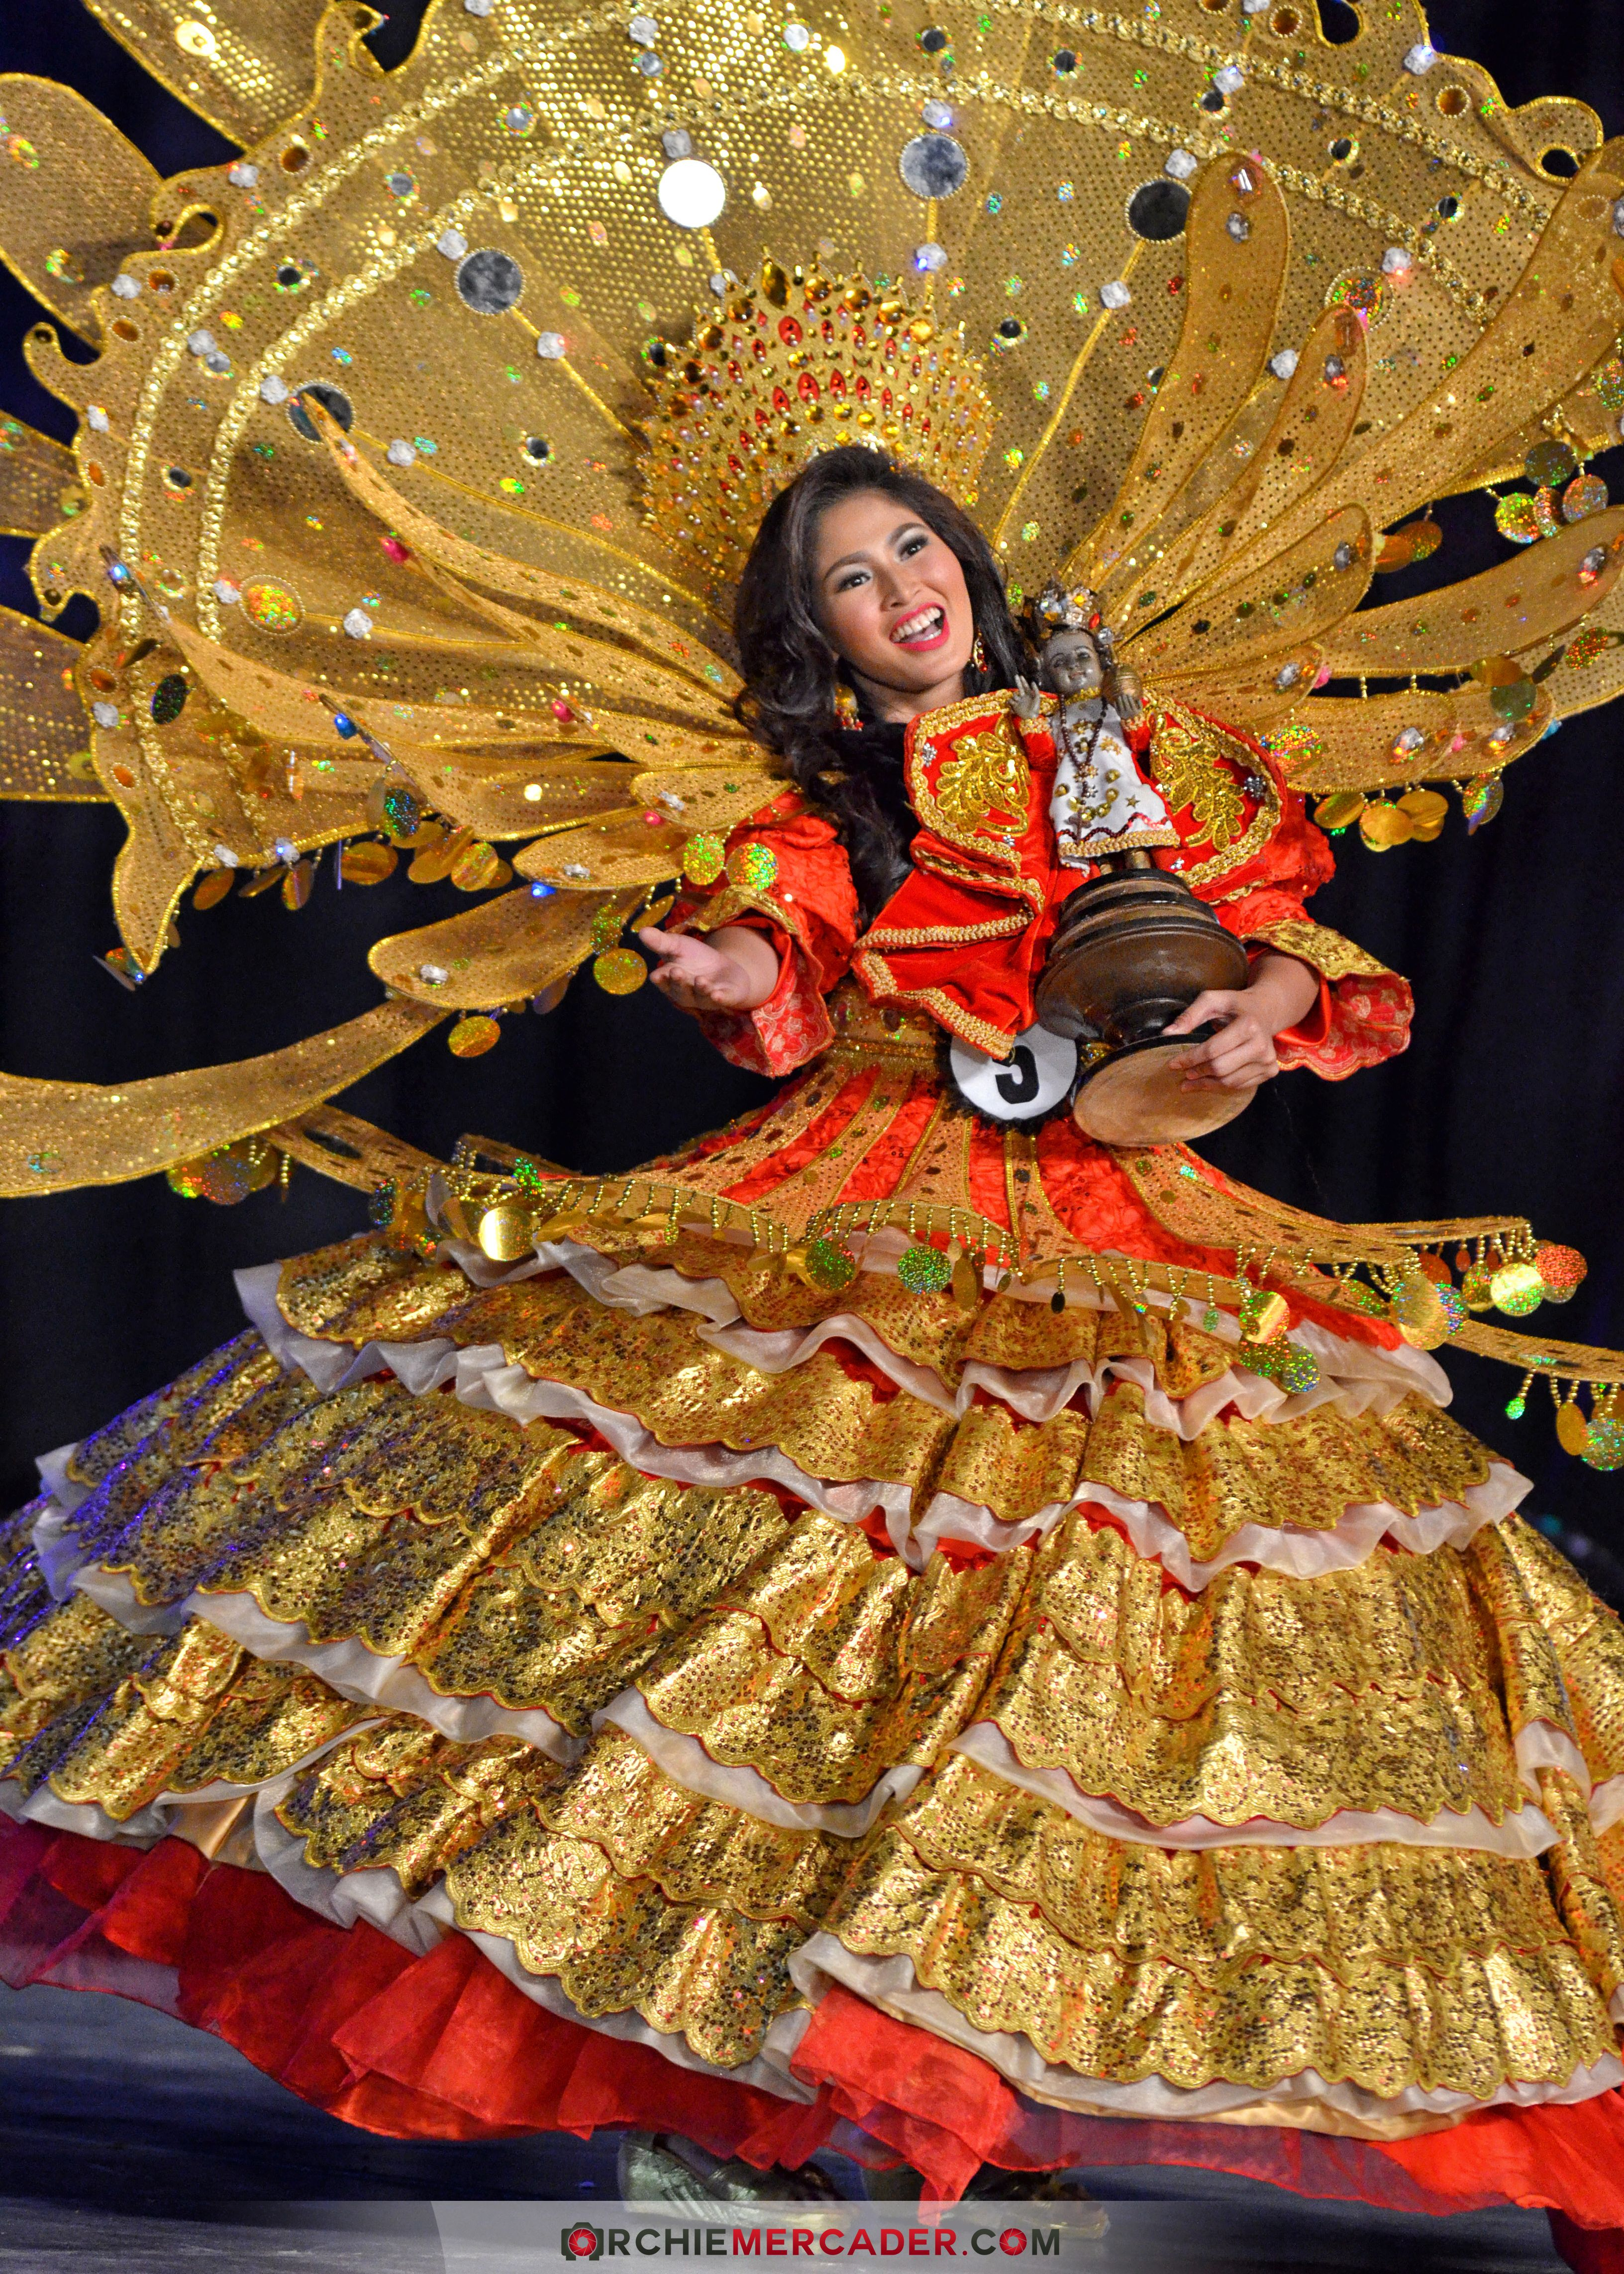 Philippine Festival Custumes Seekrit Garden S Collection Of 100 Festival Ideas